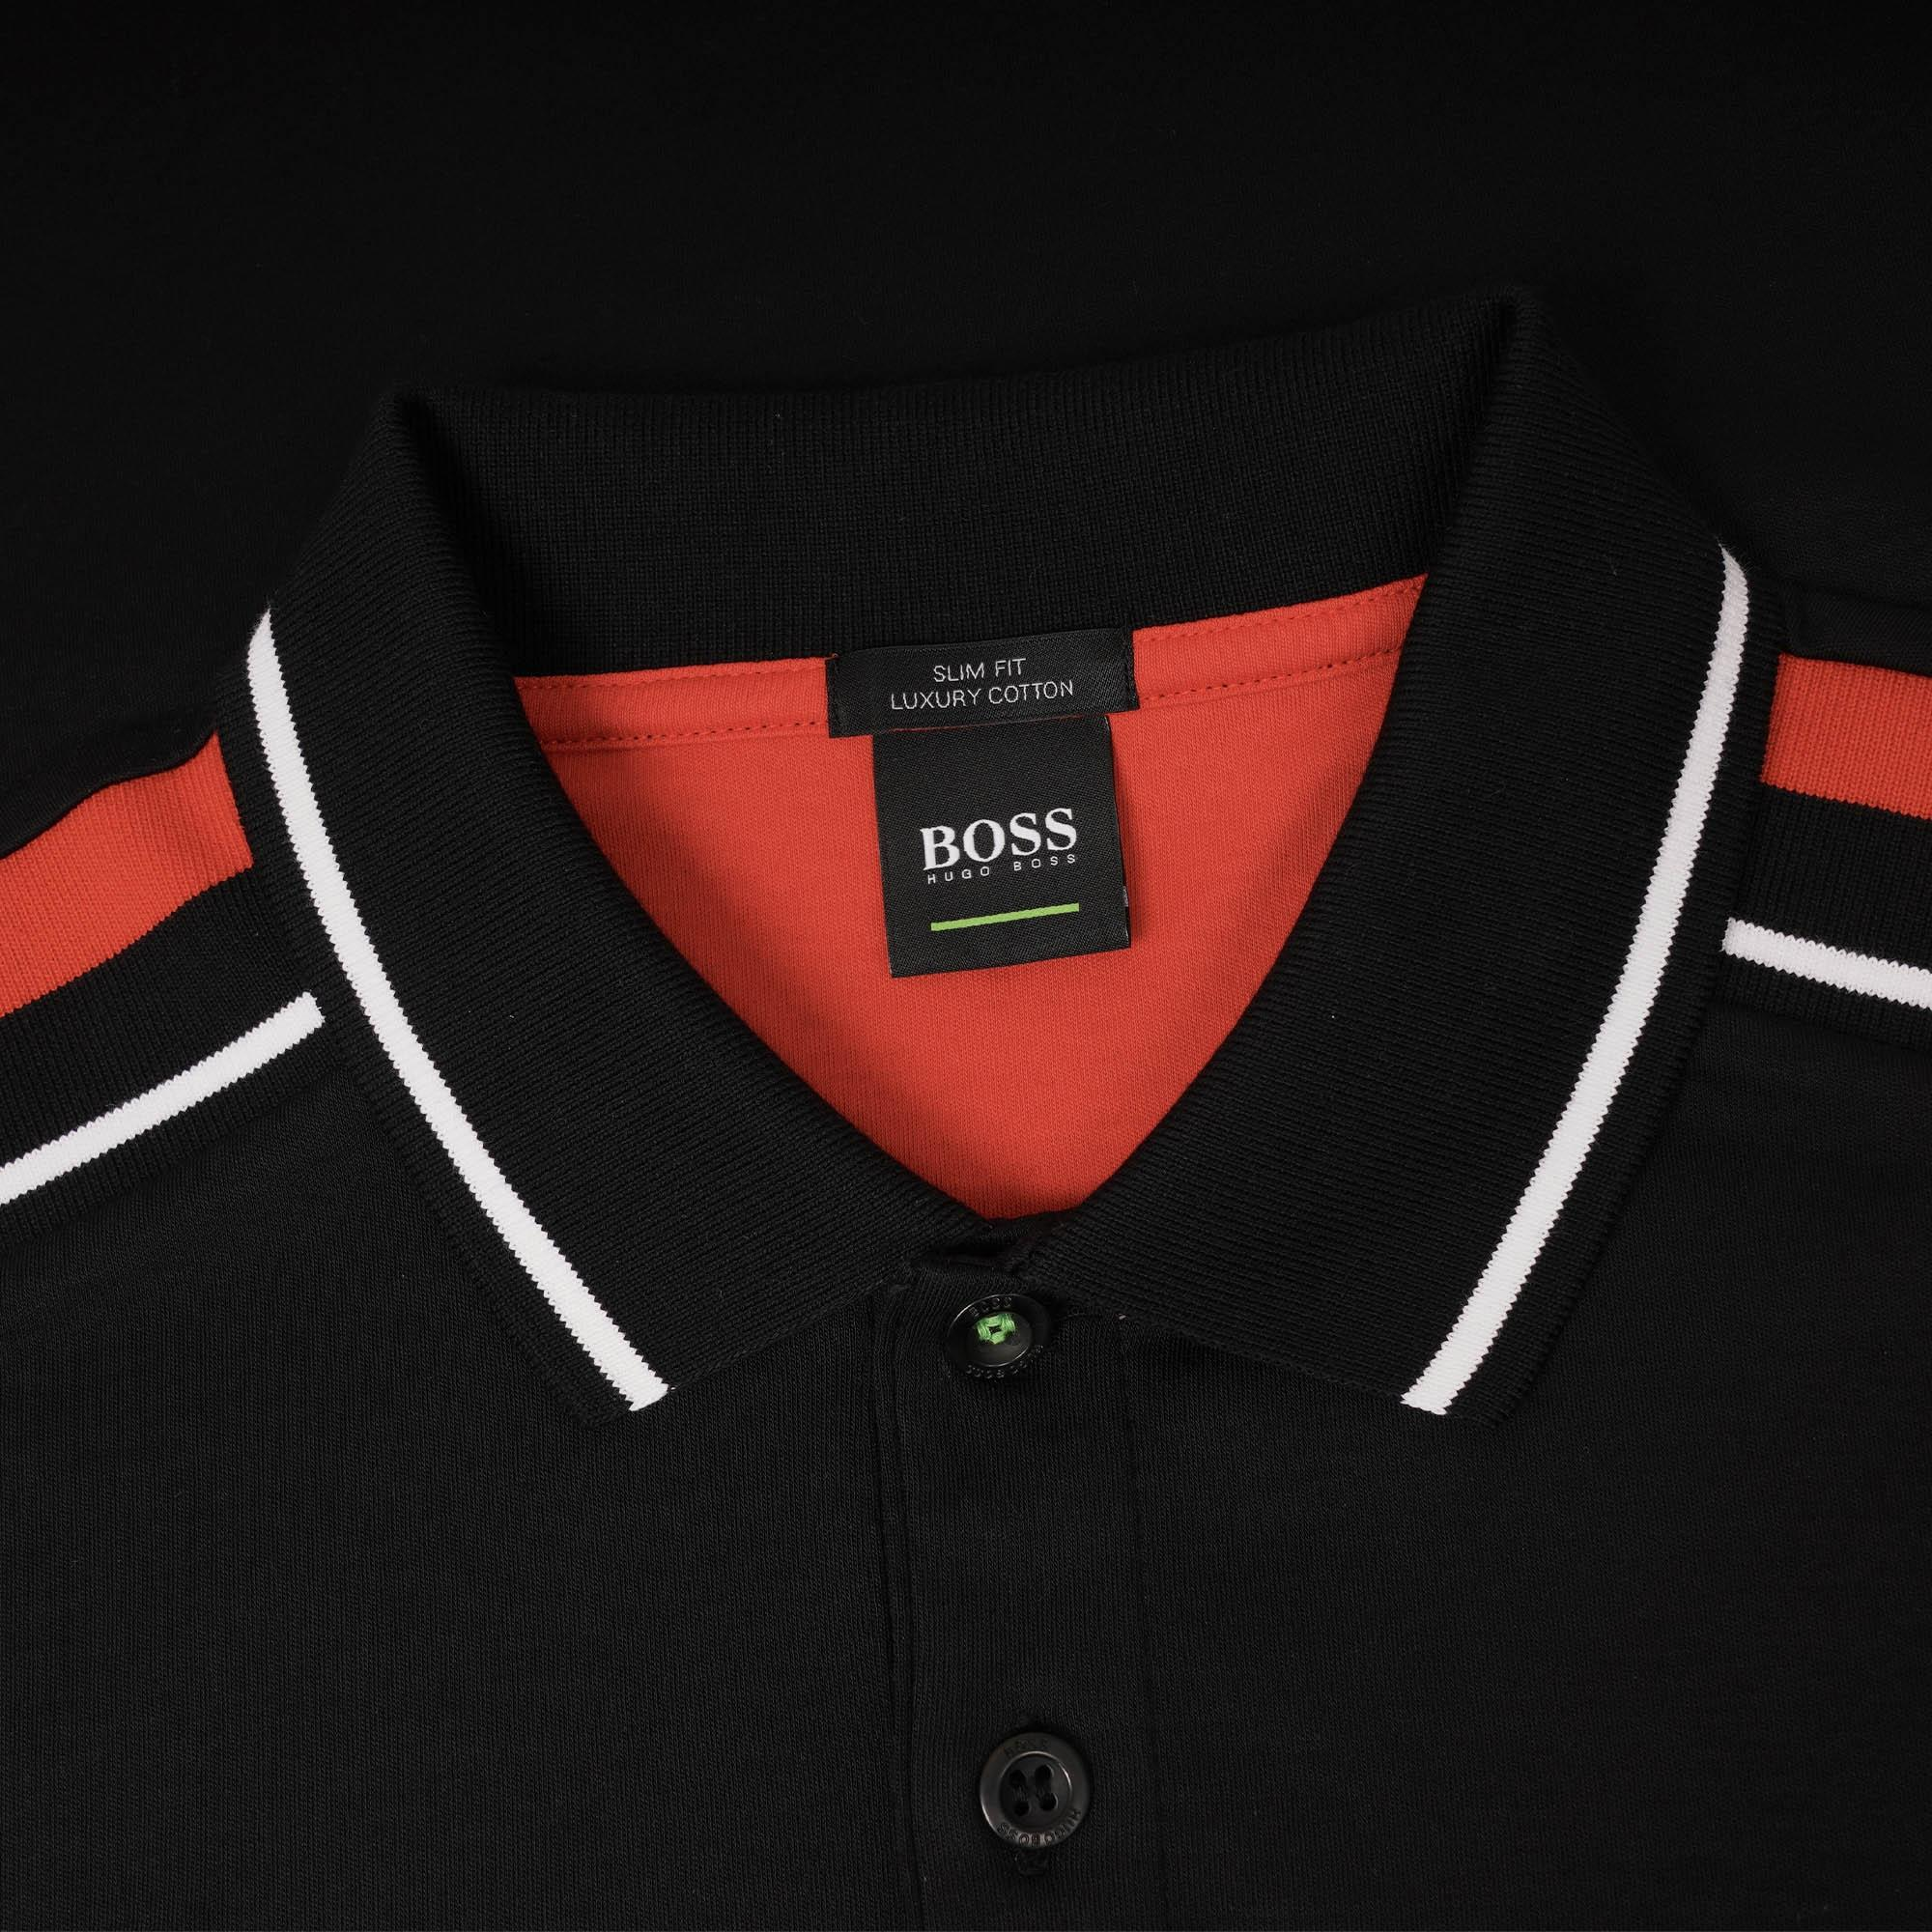 412a7a2c4 BOSS - Paule 1 Ss Colourblock Polo Shirt - Black for Men - Lyst. View  fullscreen